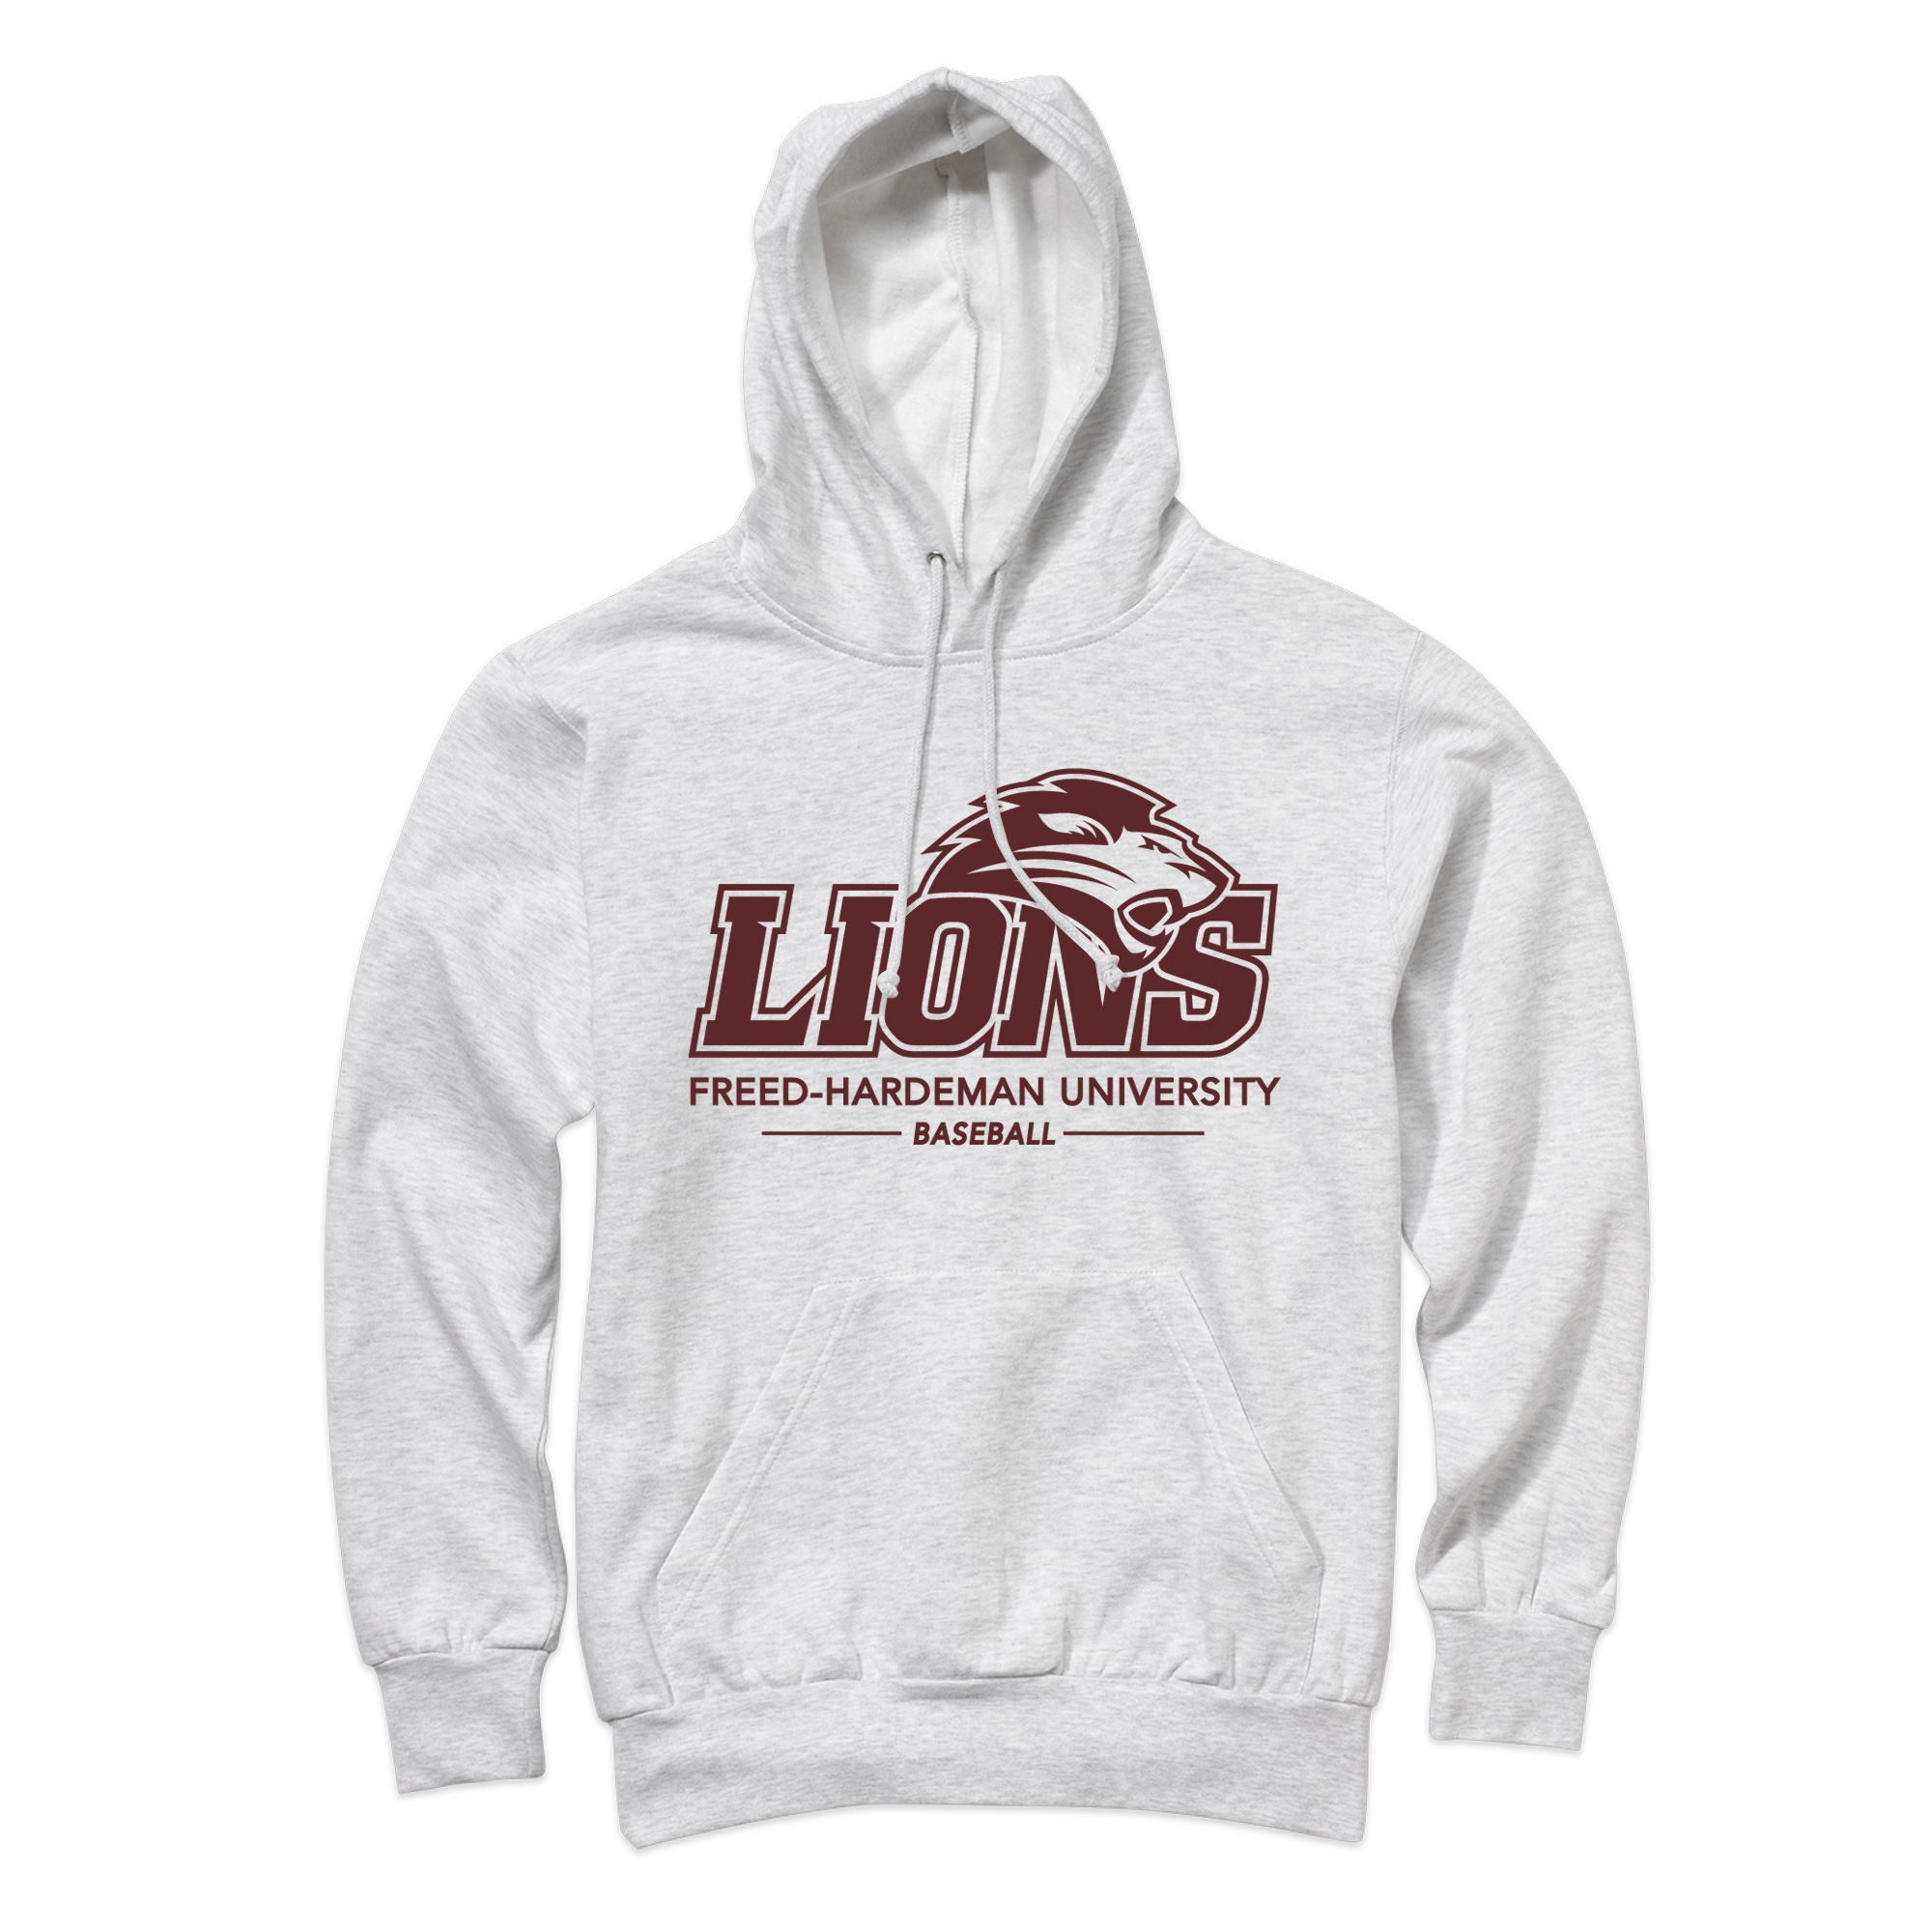 Lions Baseball Hoodie